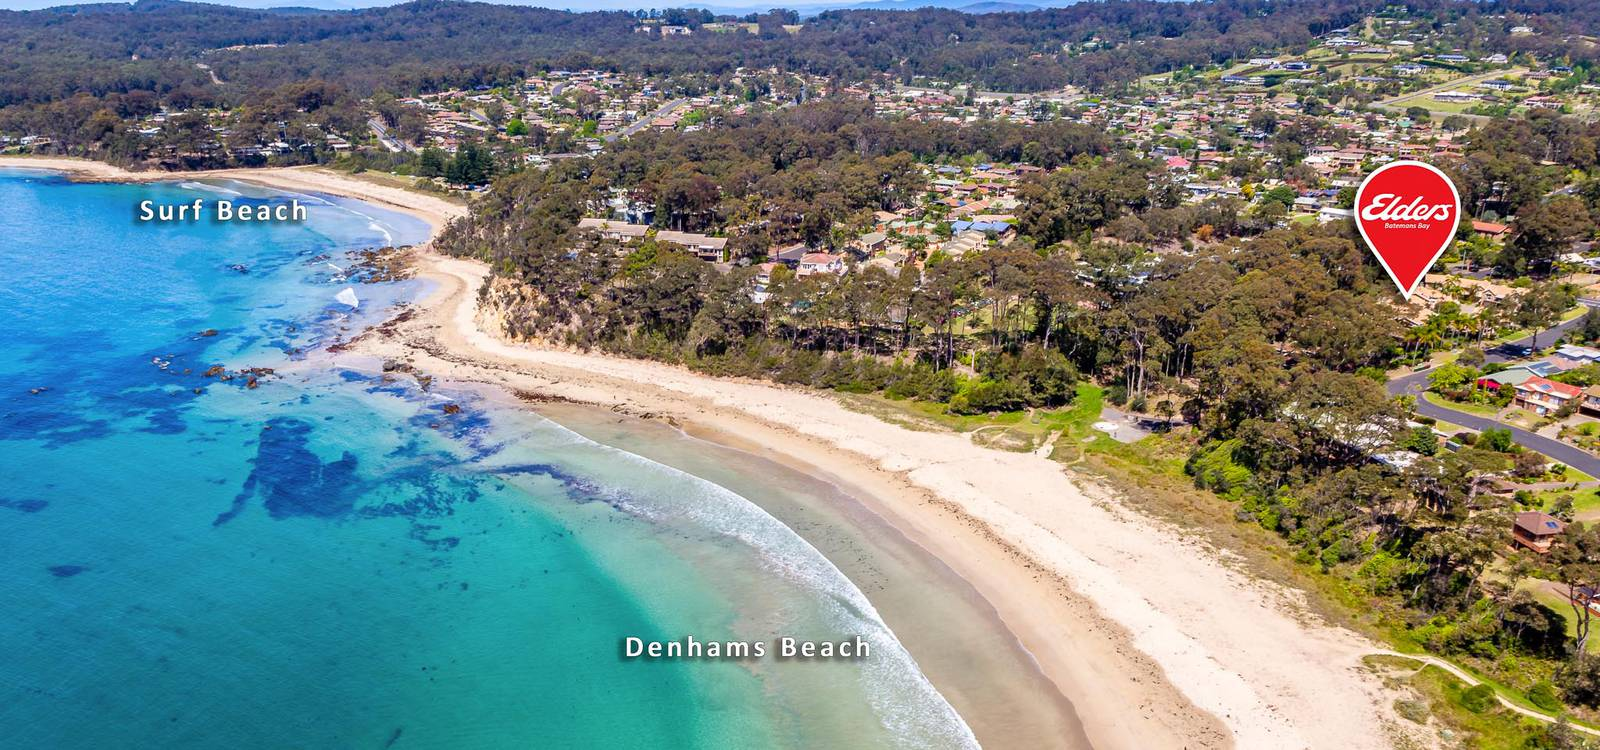 7/2A GRAYDON AVENUE DENHAMS BEACH, NSW 2536 - photo 1